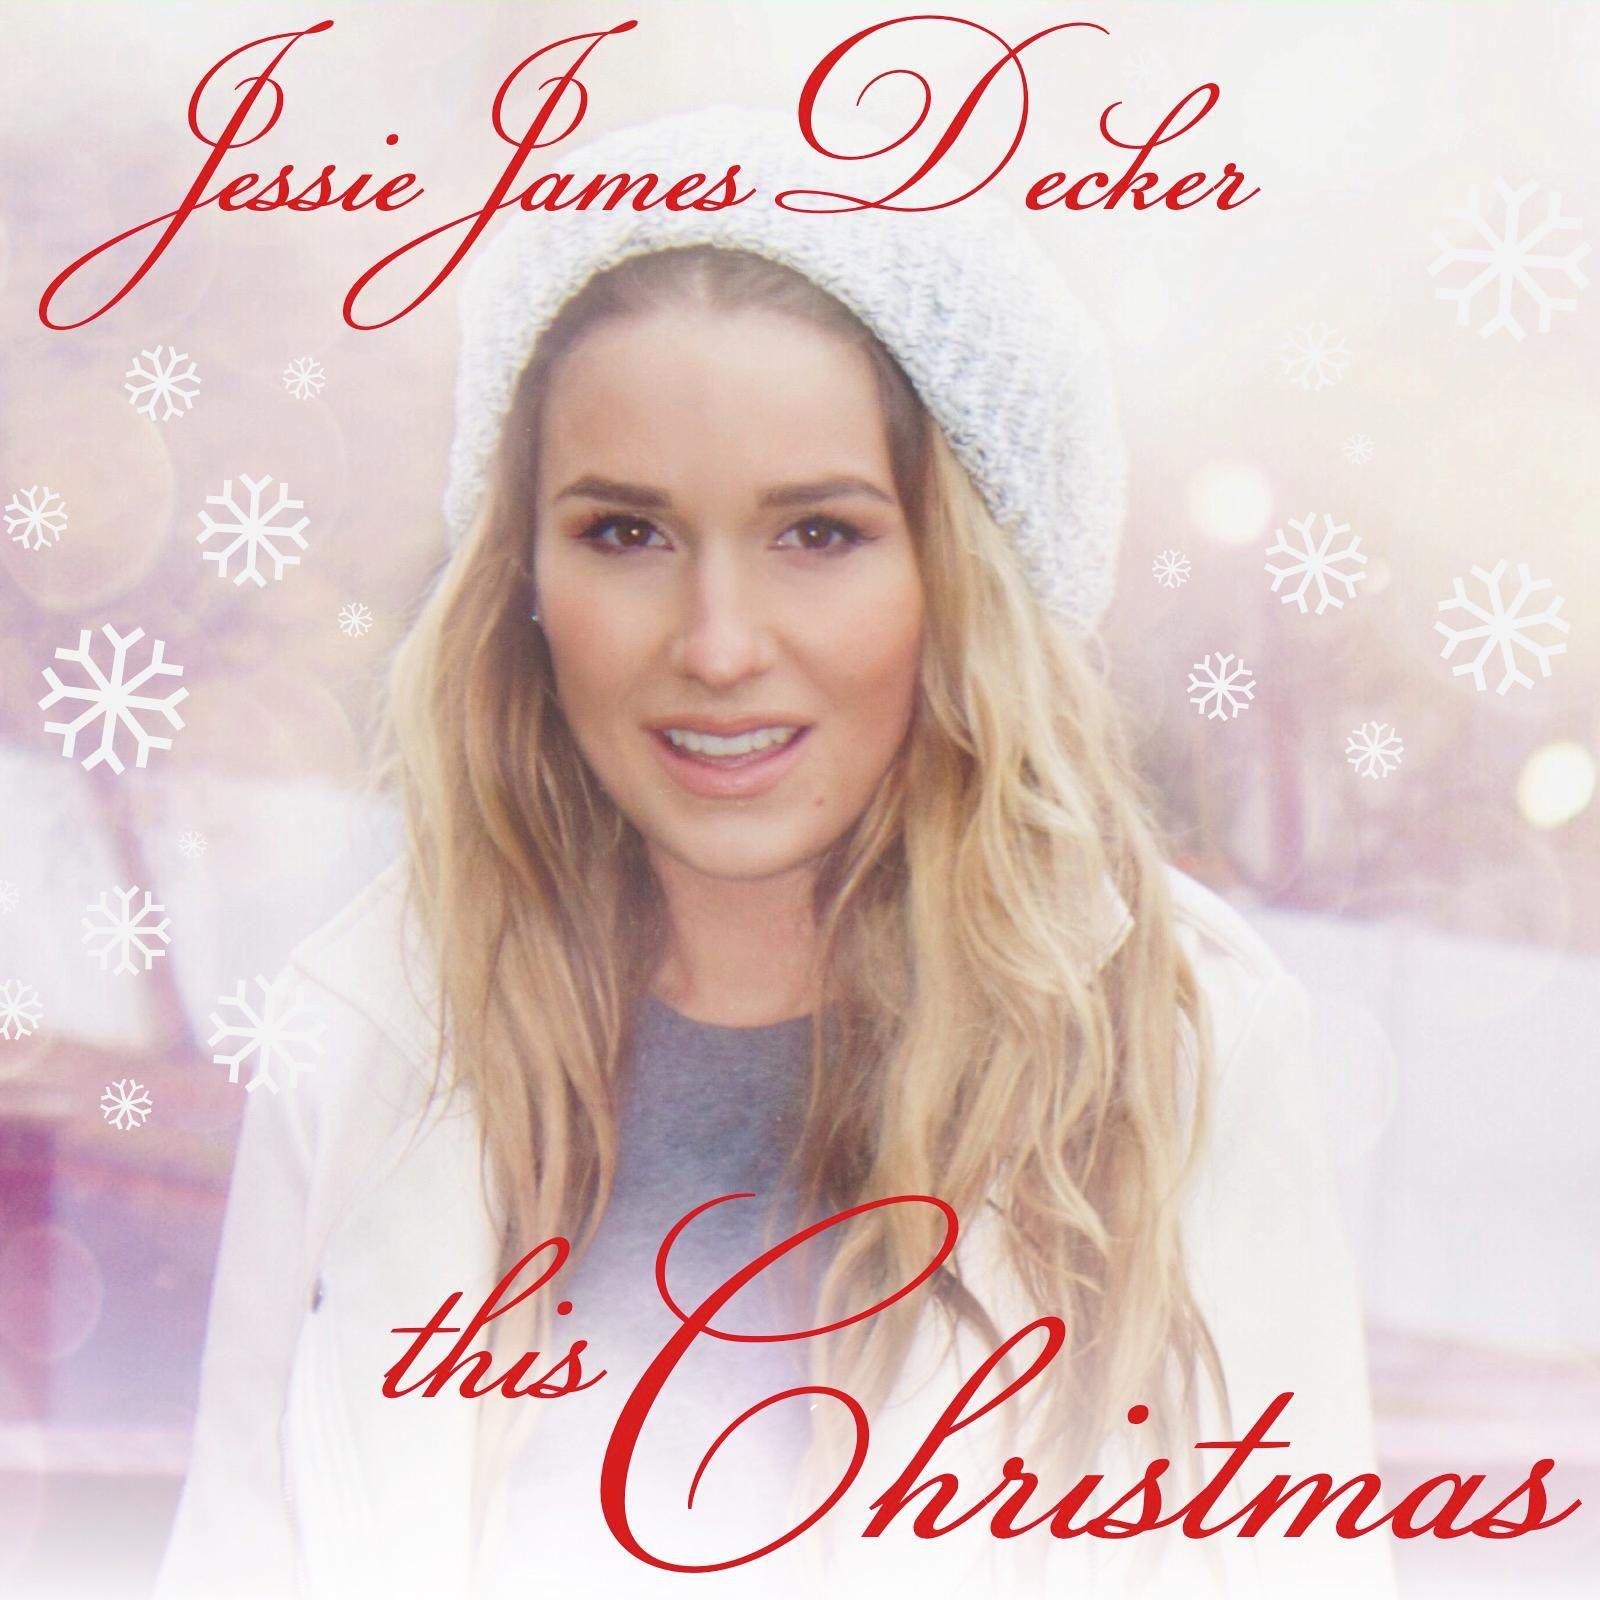 Jessie James Decker This Christmas Album Cover